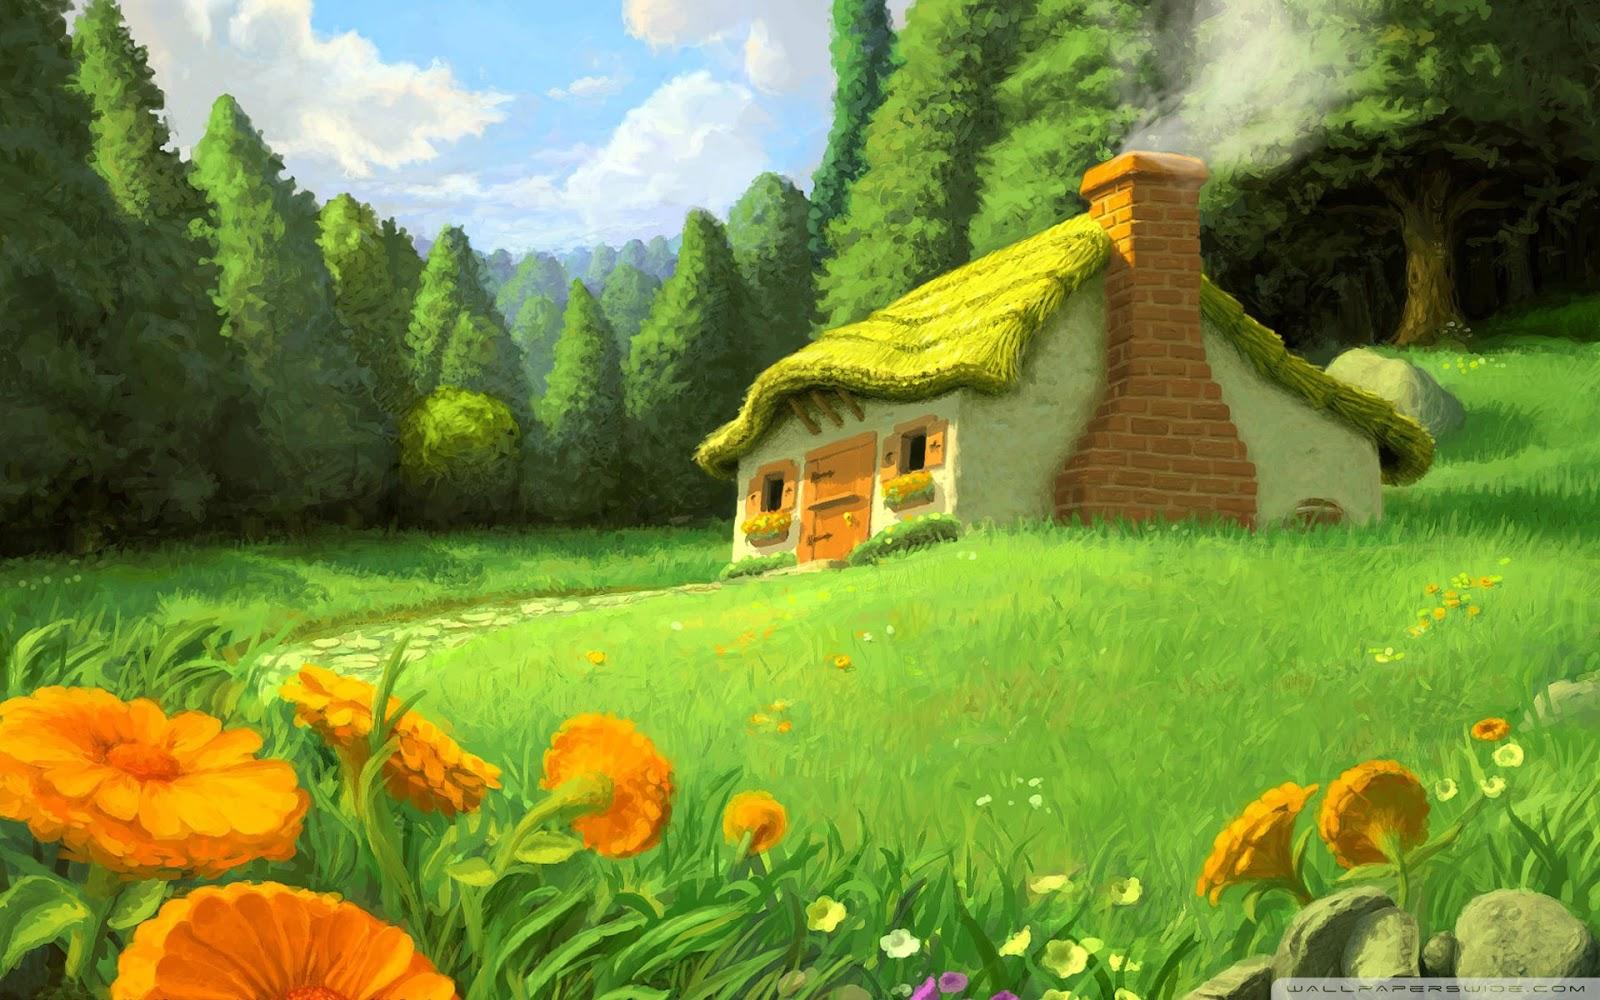 http://4.bp.blogspot.com/-FB4j78onbkk/UW_TlXOoF-I/AAAAAAAABgo/Op7At_1Af6I/s1600/fantasy_landscape-wallpaper-1920x1200.jpg